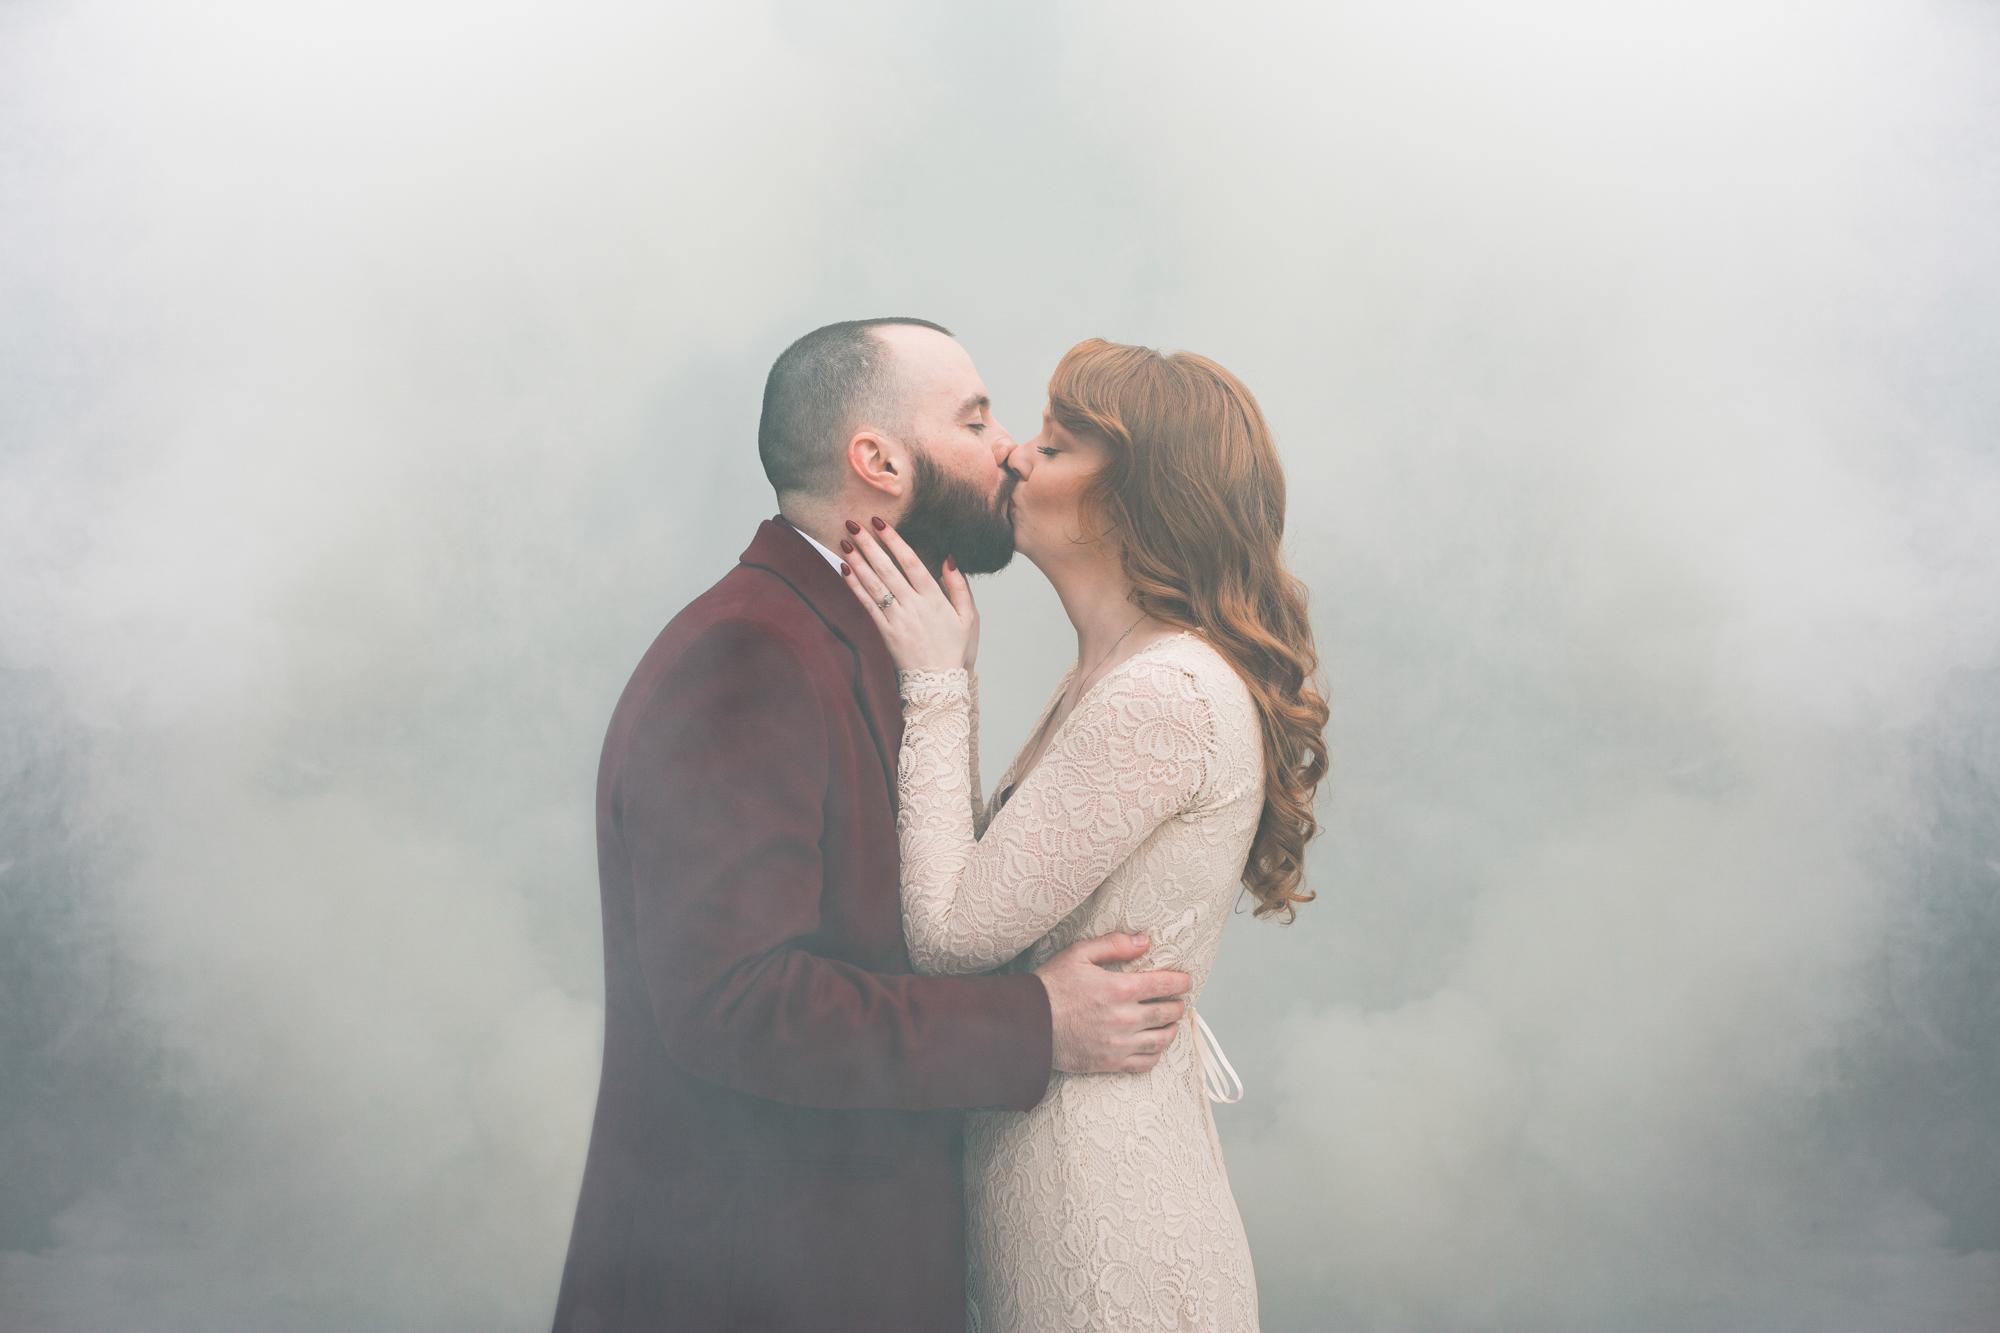 Smoke bomb wedding photos Toronto